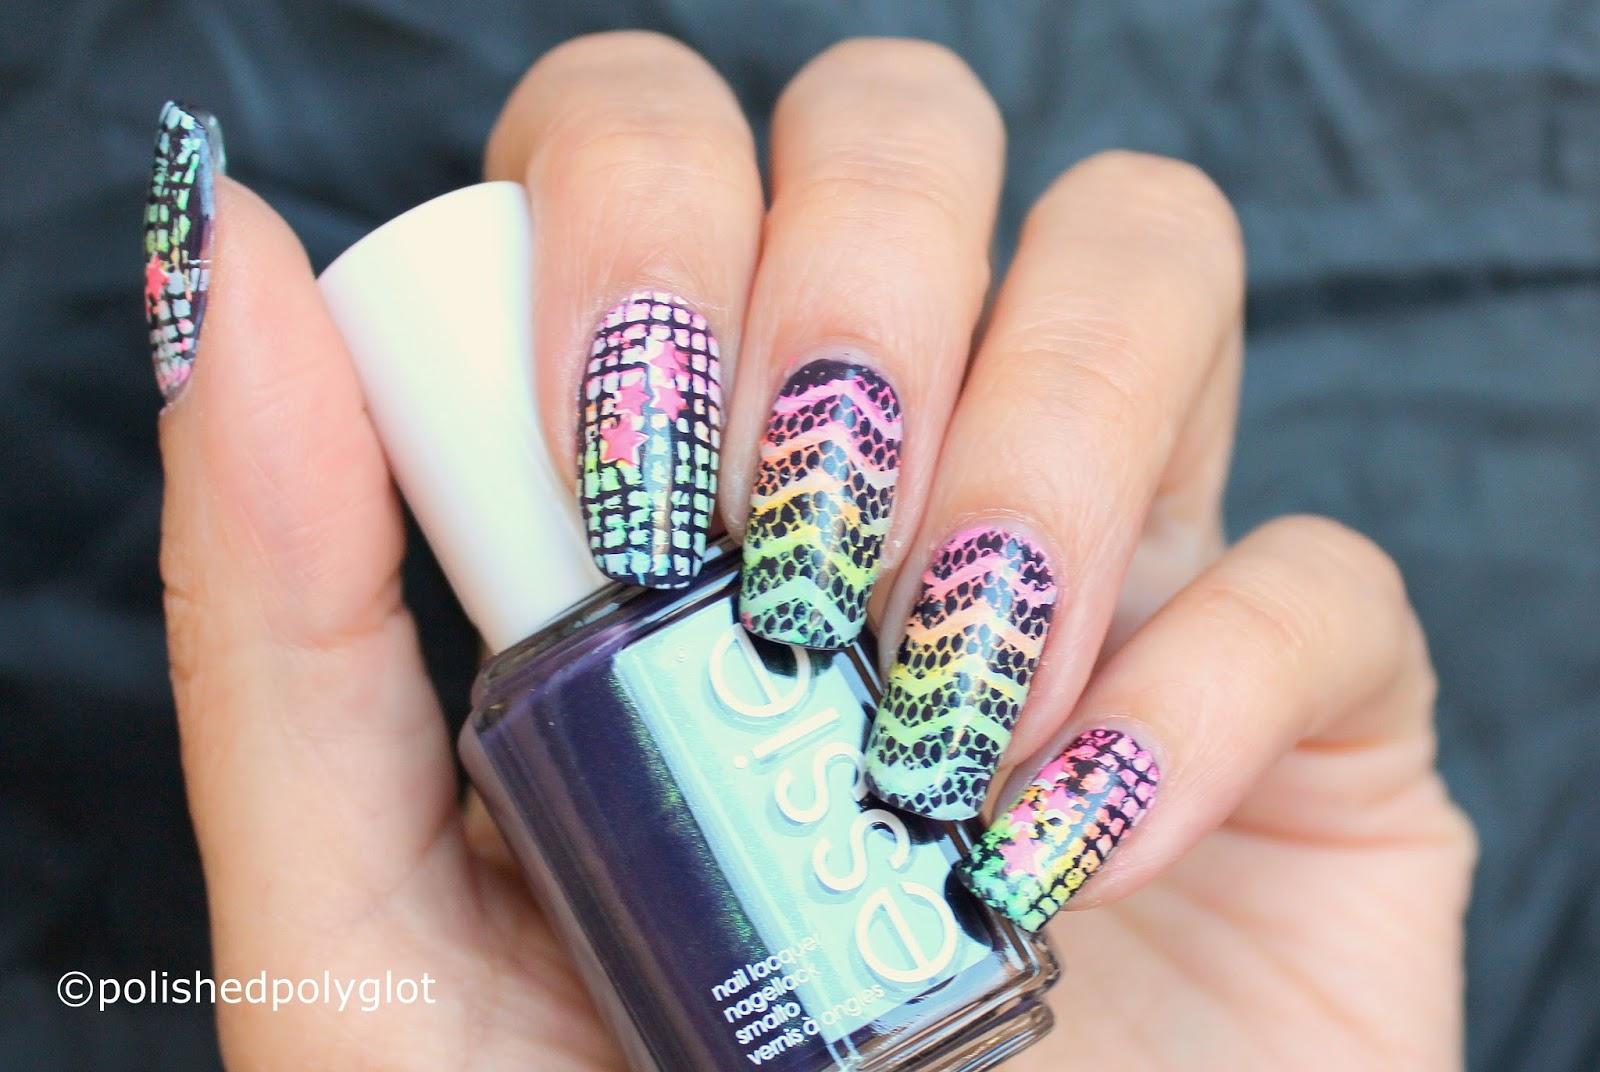 Nail Art │ Neon Rainbow Nail Design [26 Great Nail Art Ideas ...